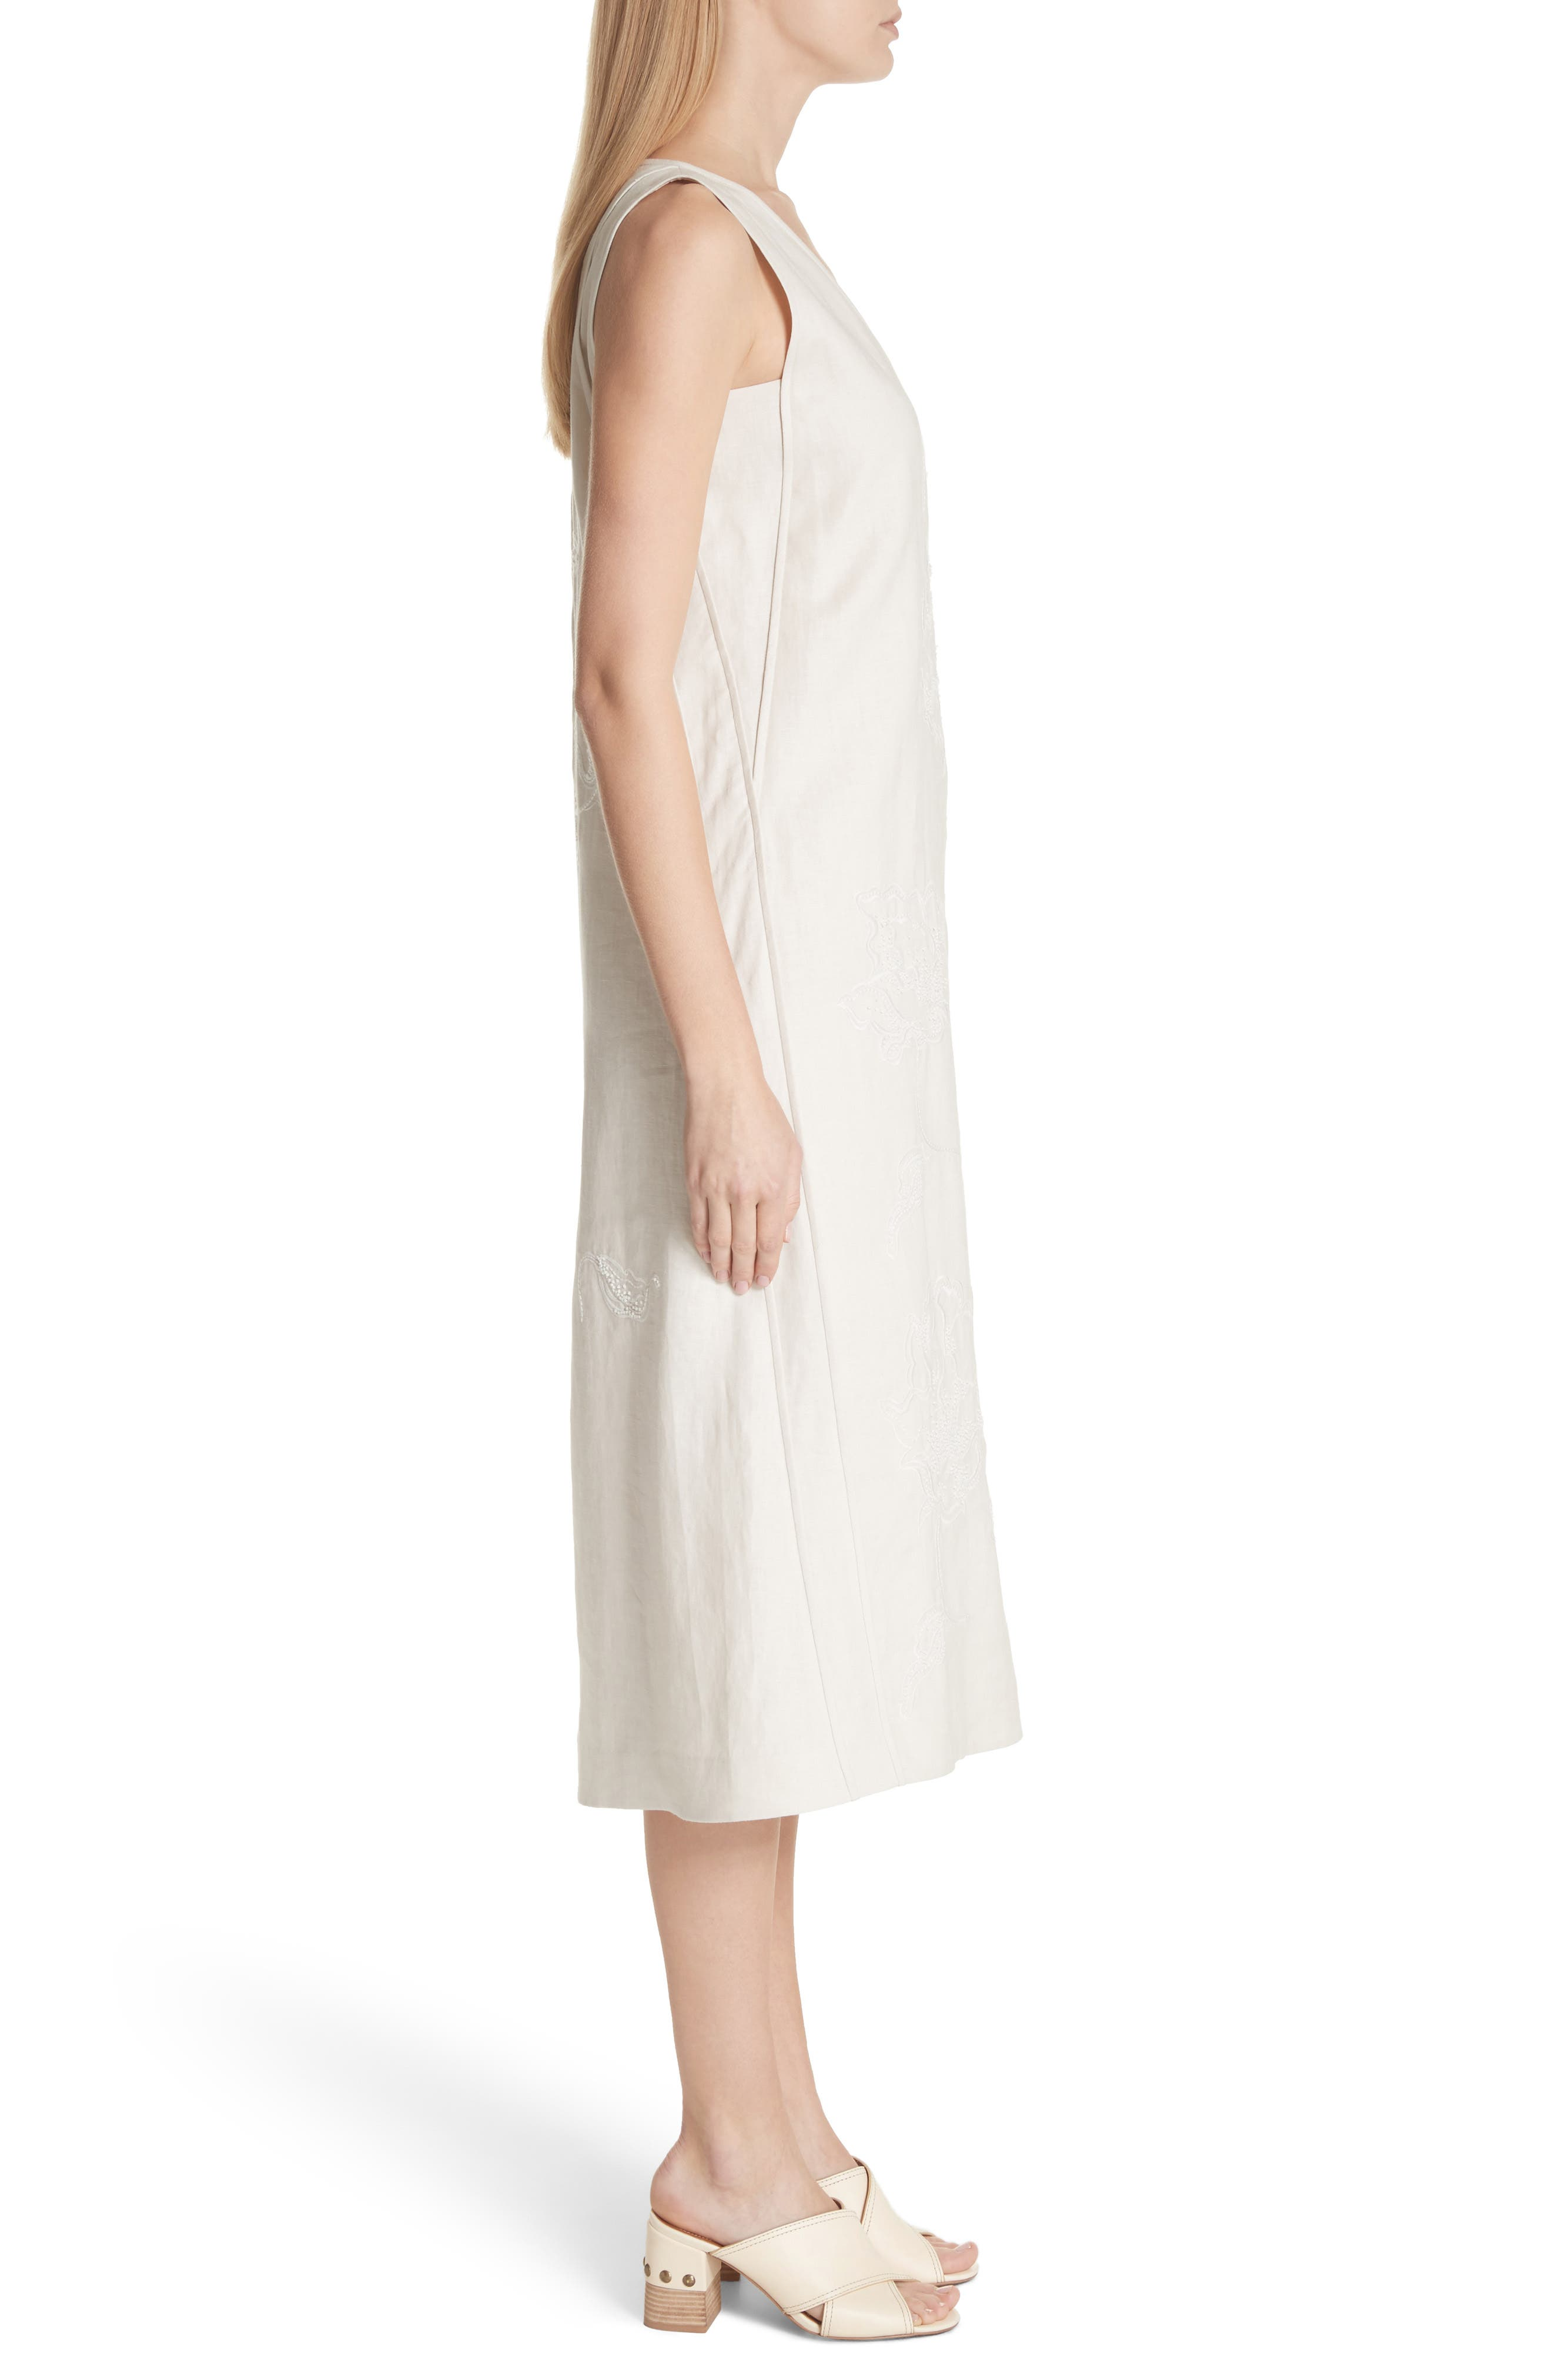 Duncan Embroidered Linen Dress,                             Alternate thumbnail 3, color,                             252